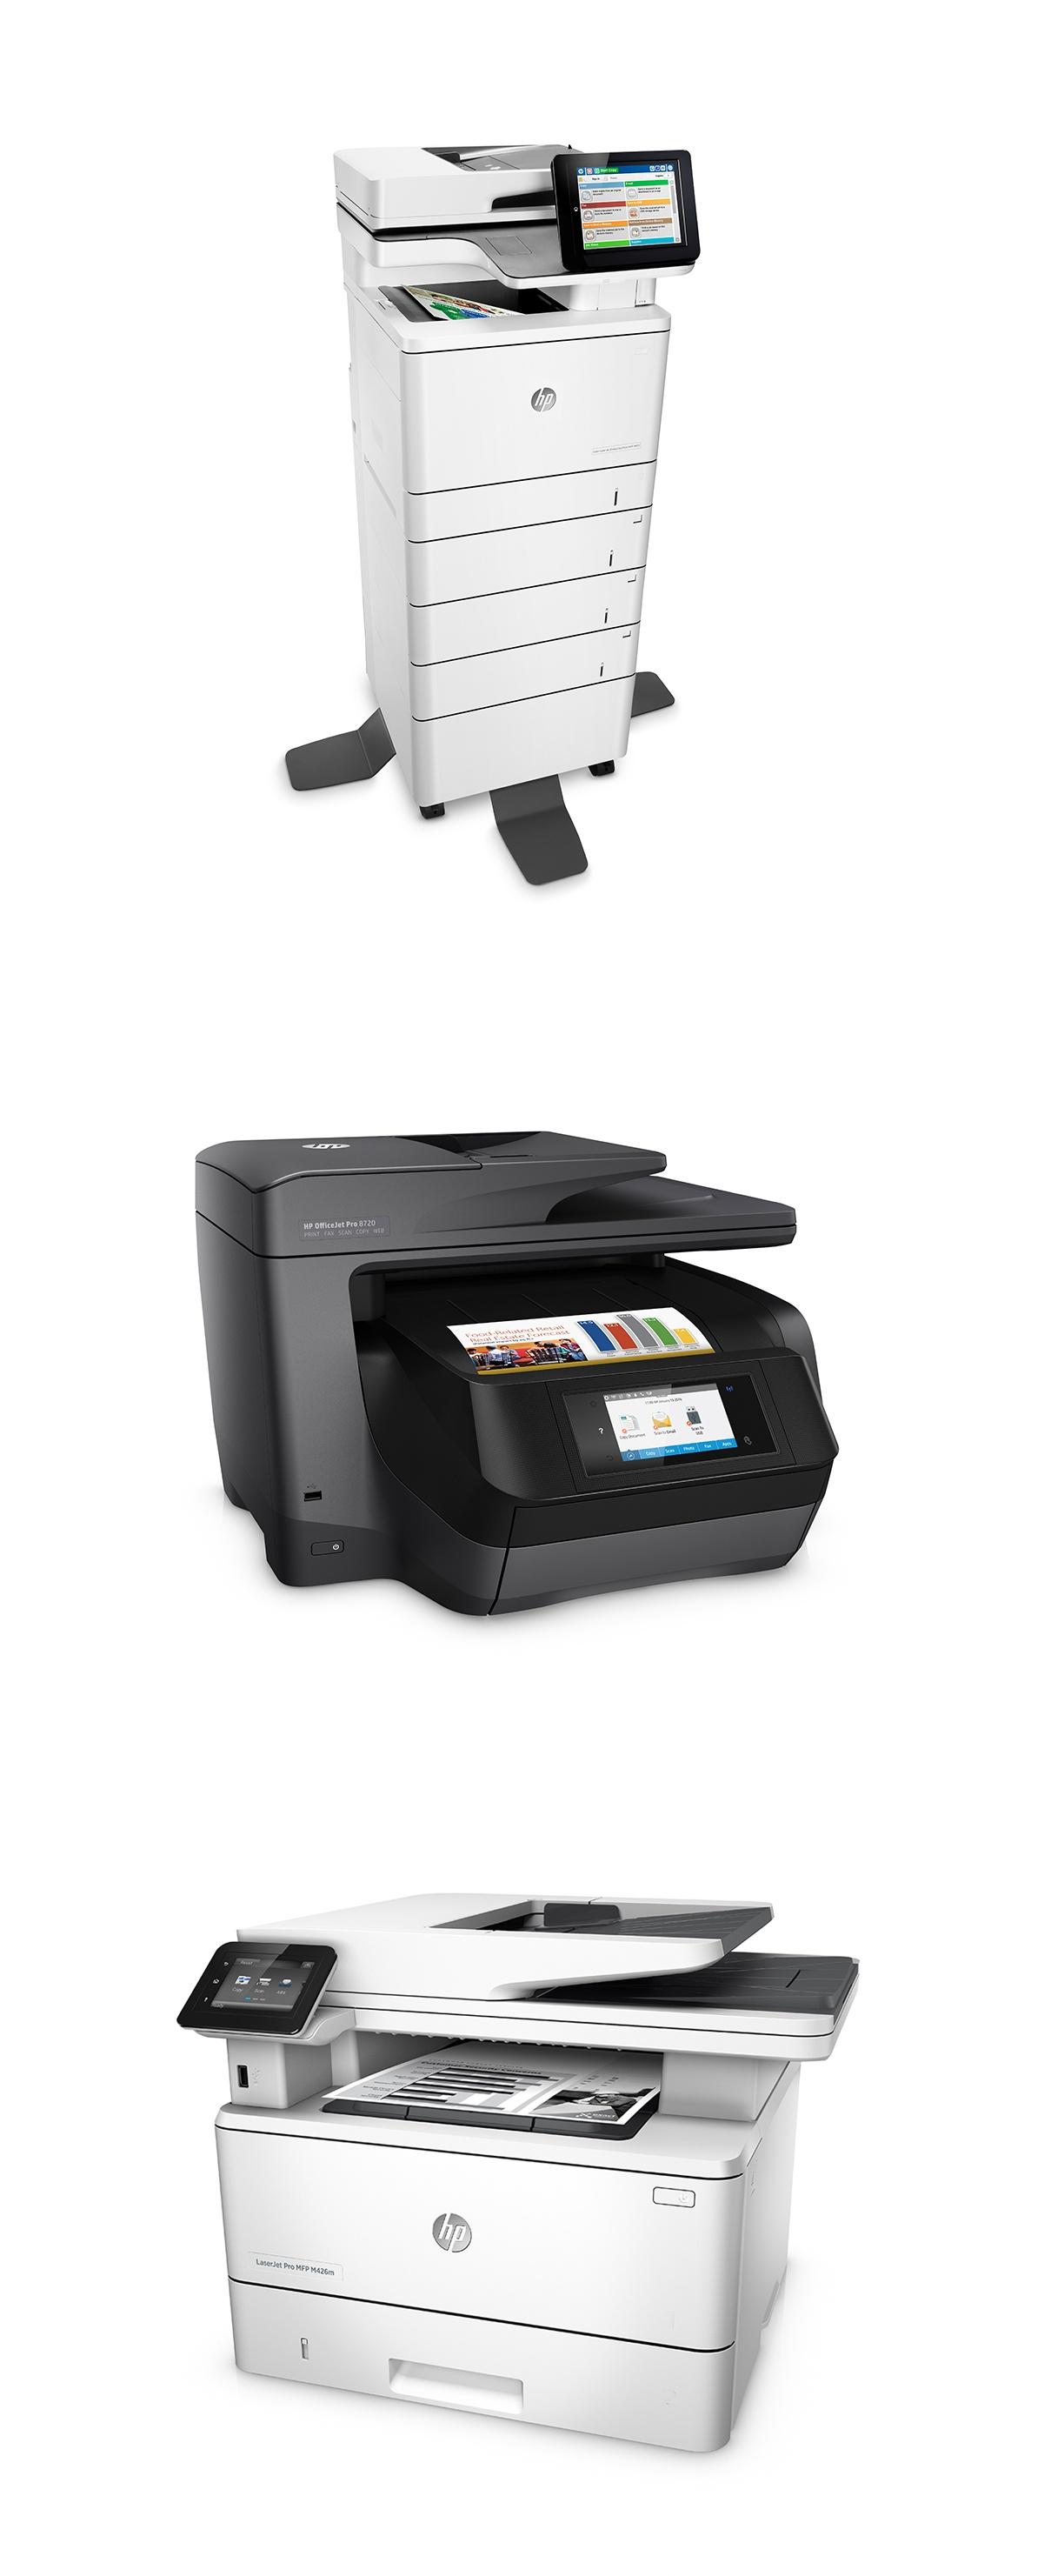 hpprinters3.jpg